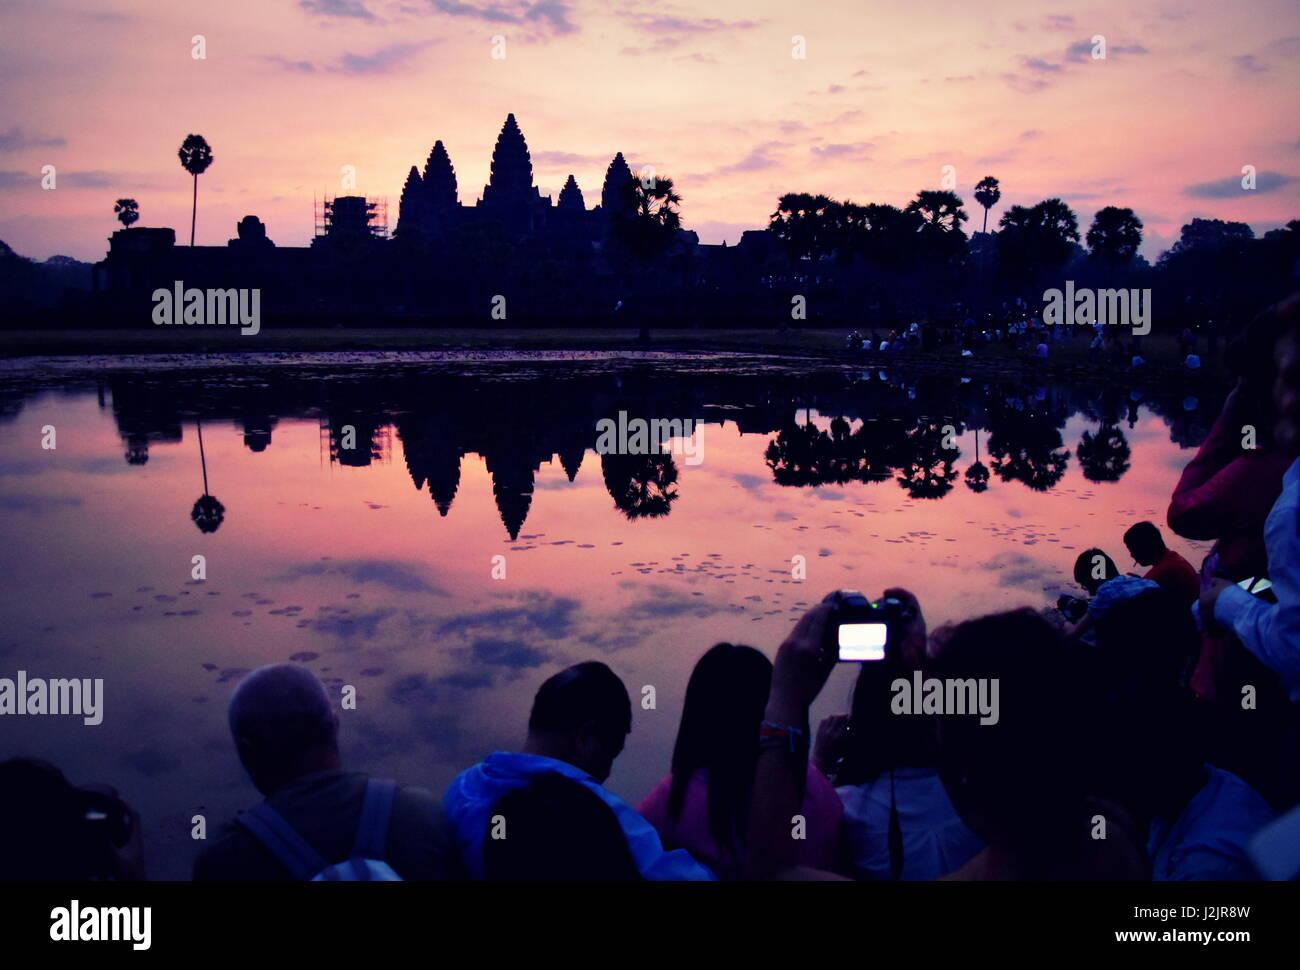 Schönen sonnenaufgang Farben über Angkor Wat antiken Tempelruinen, Kambodscha Stockbild